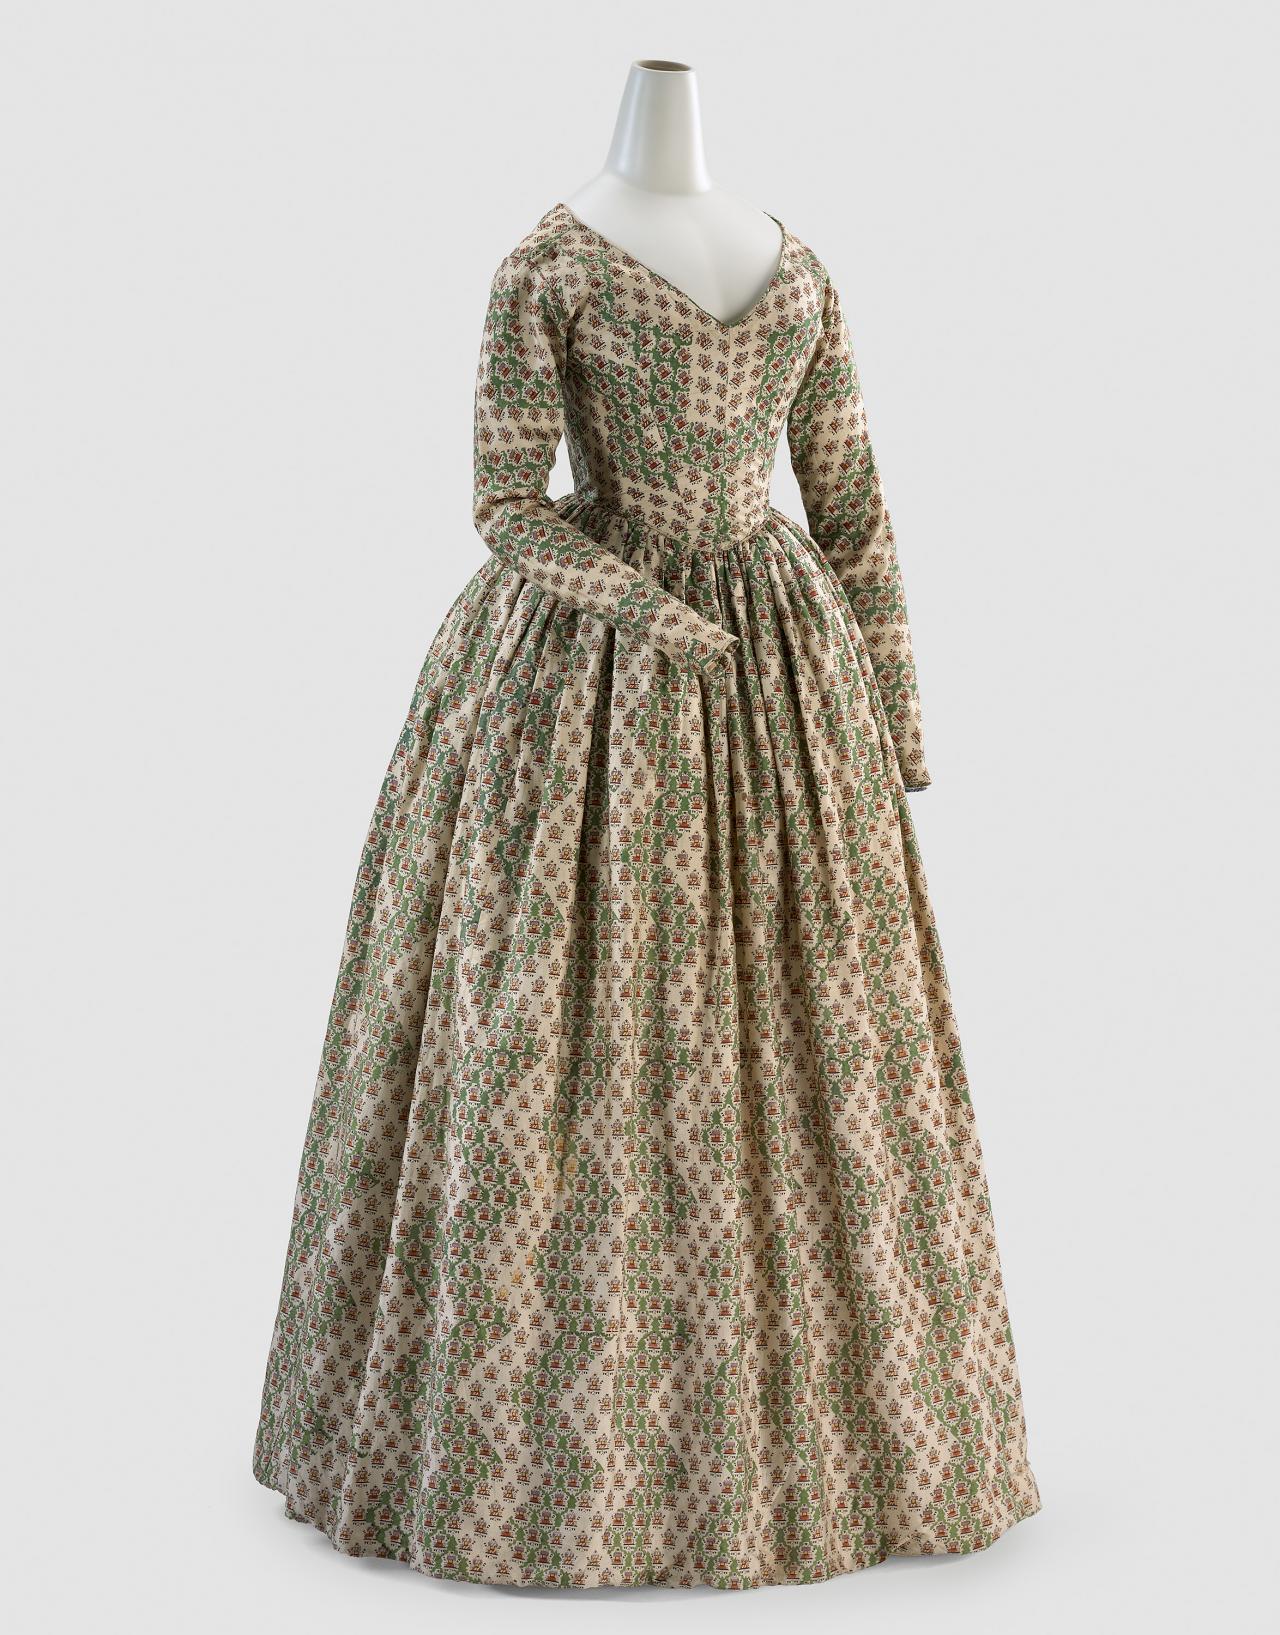 585d2a0bd Print Dress, circa 1840 (National Gallery of Victoria)